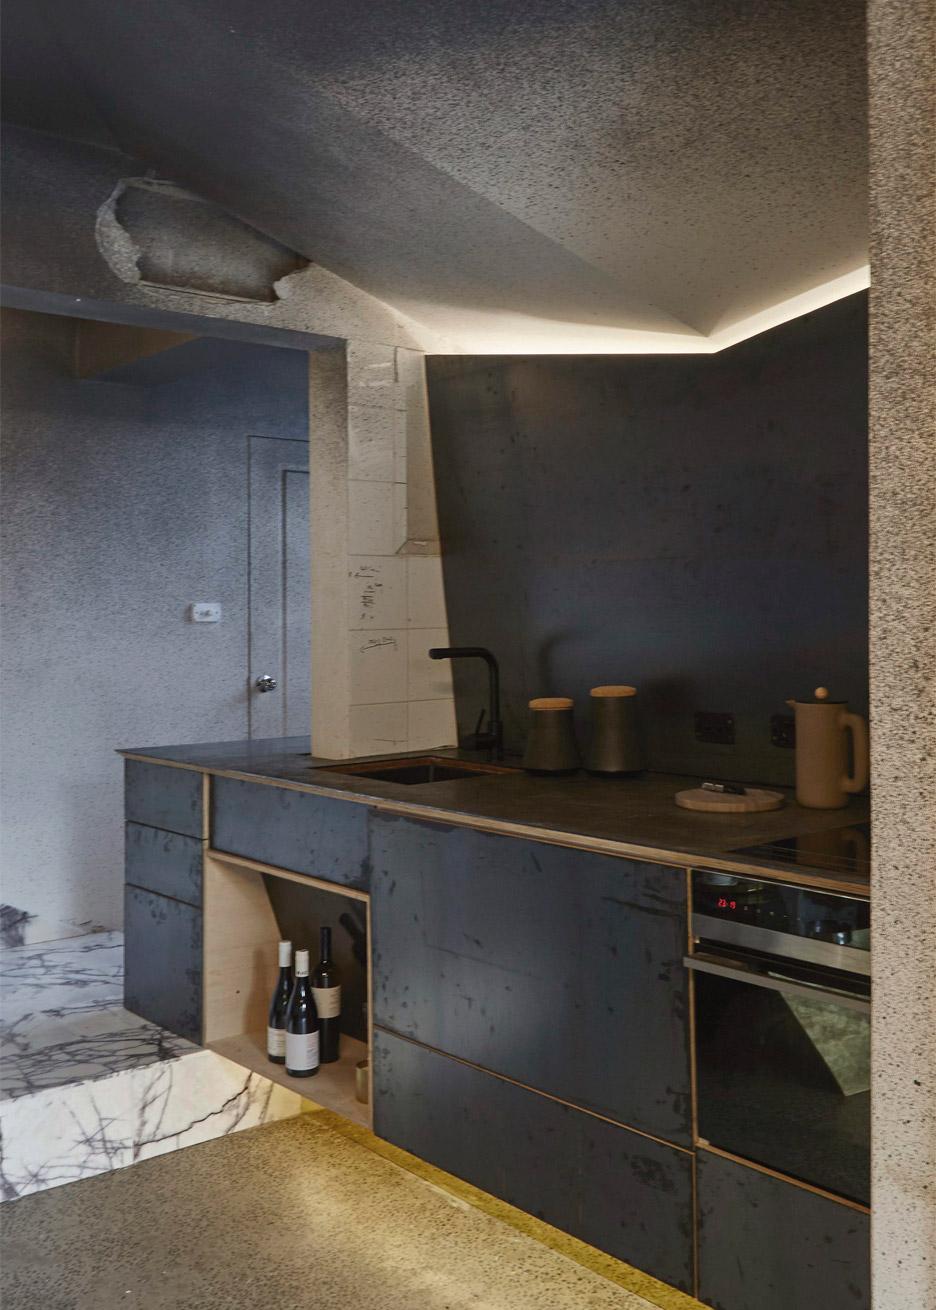 microlux-melbourne-australia-apartment-interior-design-edwards-moore_dezeen_936_1.jpg